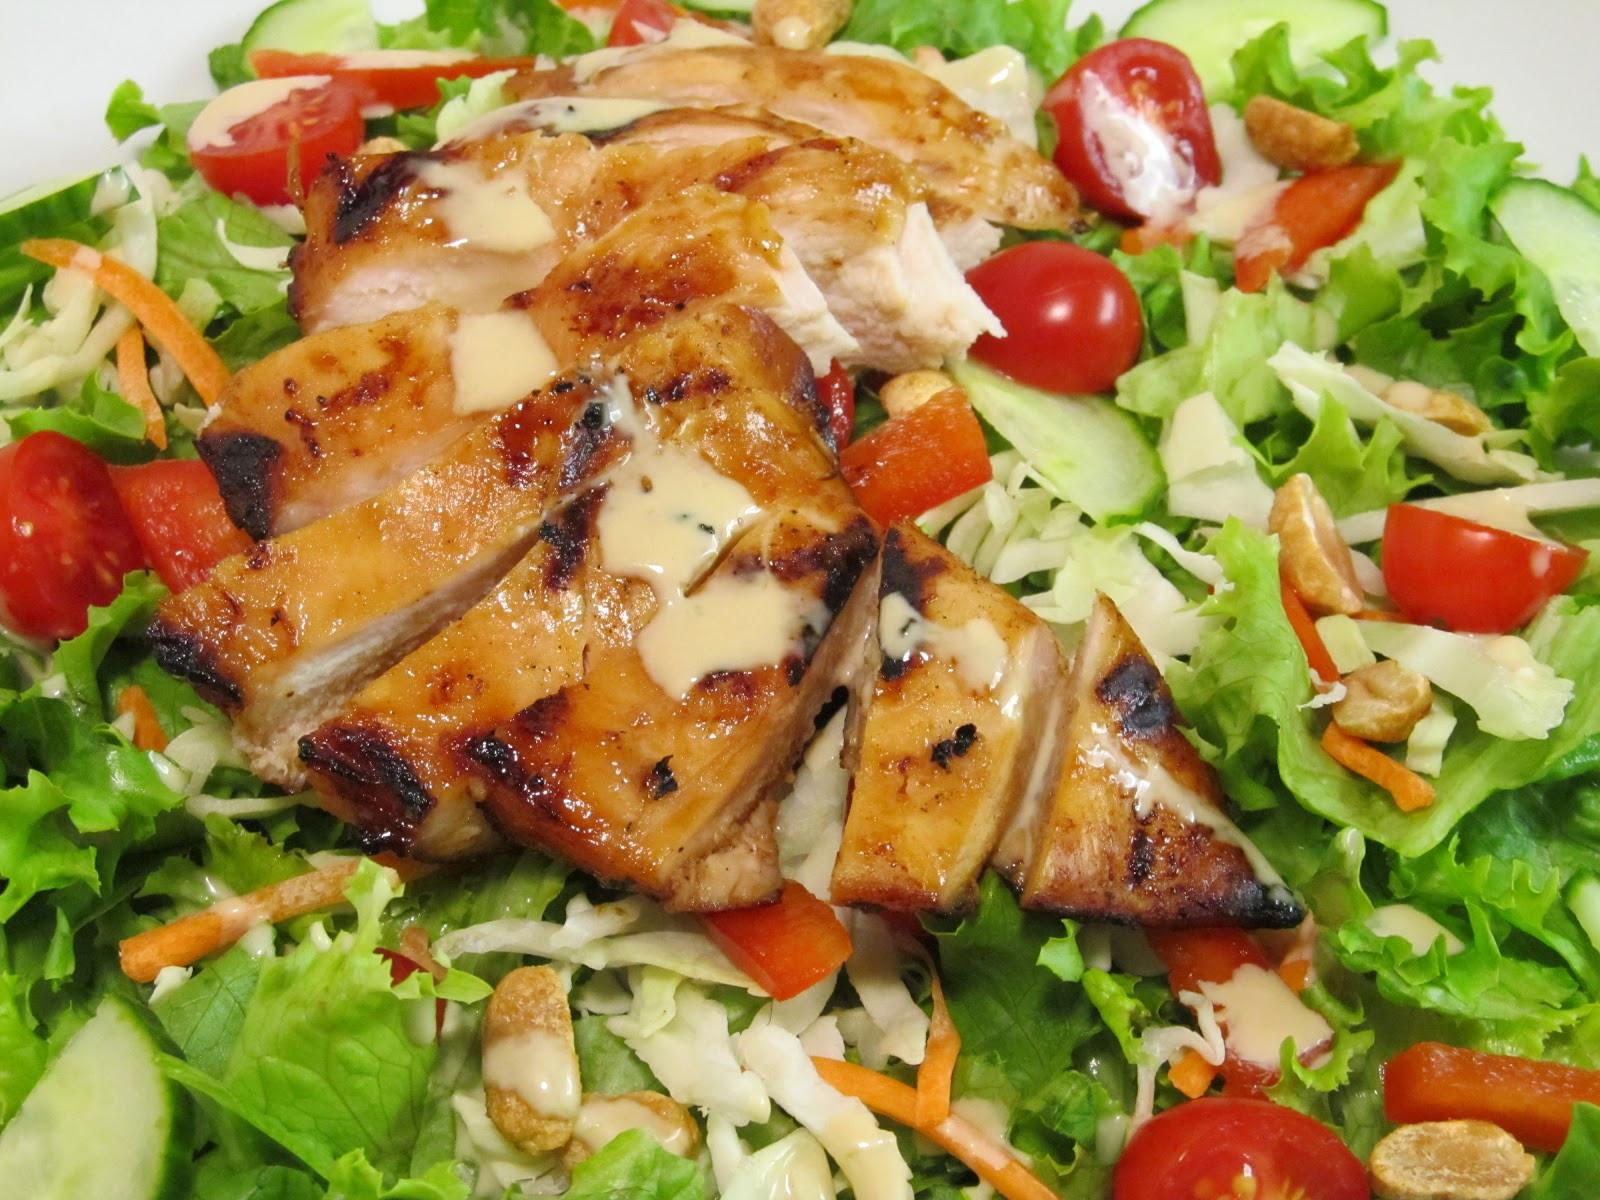 Teriyaki Chicken Salad  Jenn s Food Journey Grilled Teriyaki Chicken Salad with